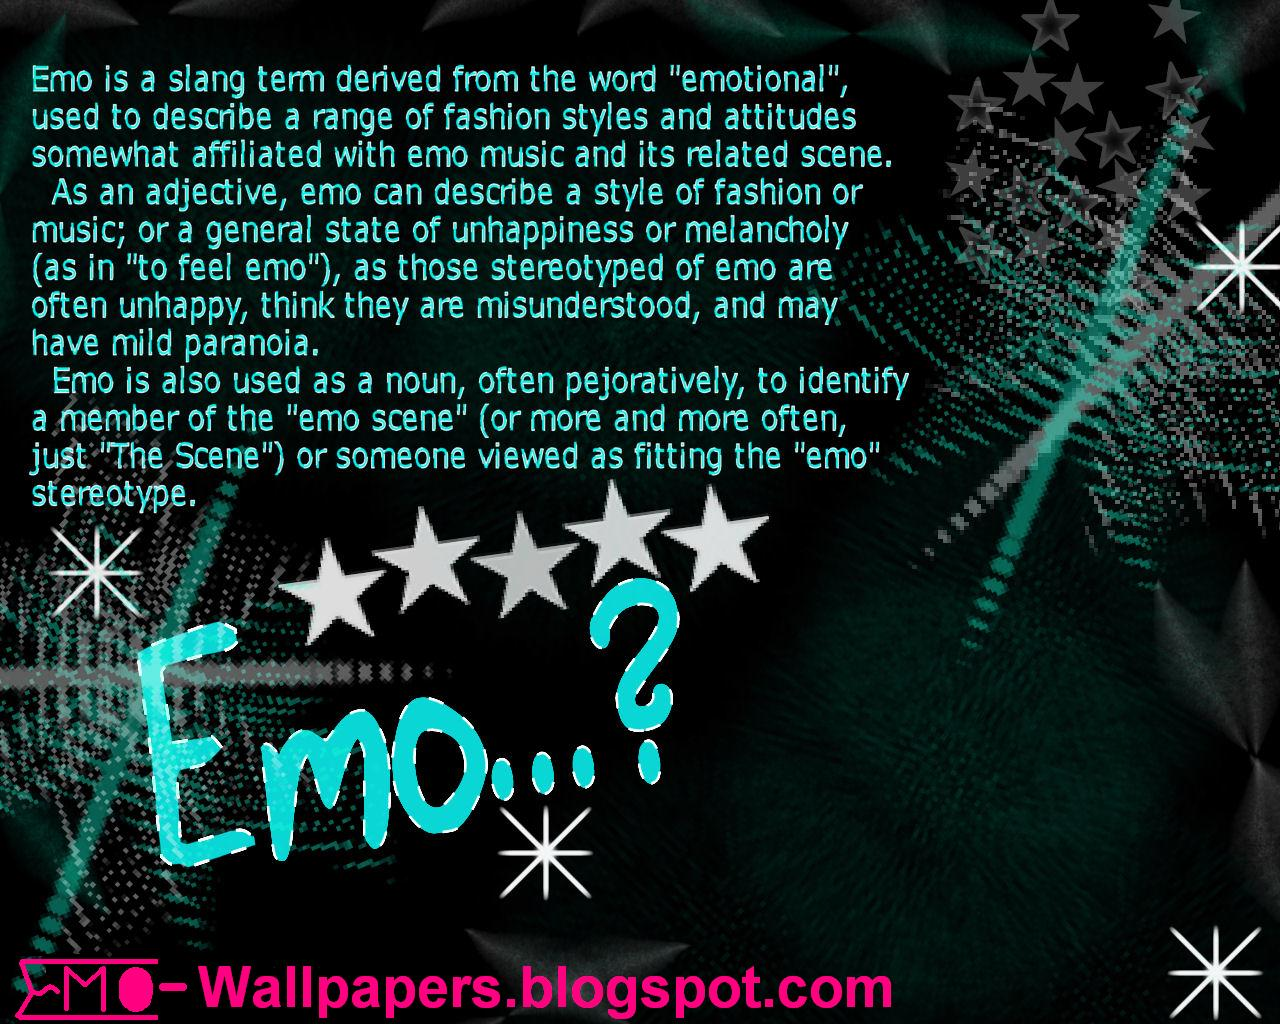 http://4.bp.blogspot.com/_WmfnL79SyIE/THzeP842kWI/AAAAAAAAC2g/PGXrbCqNyOg/s1600/emo_definition.jpg